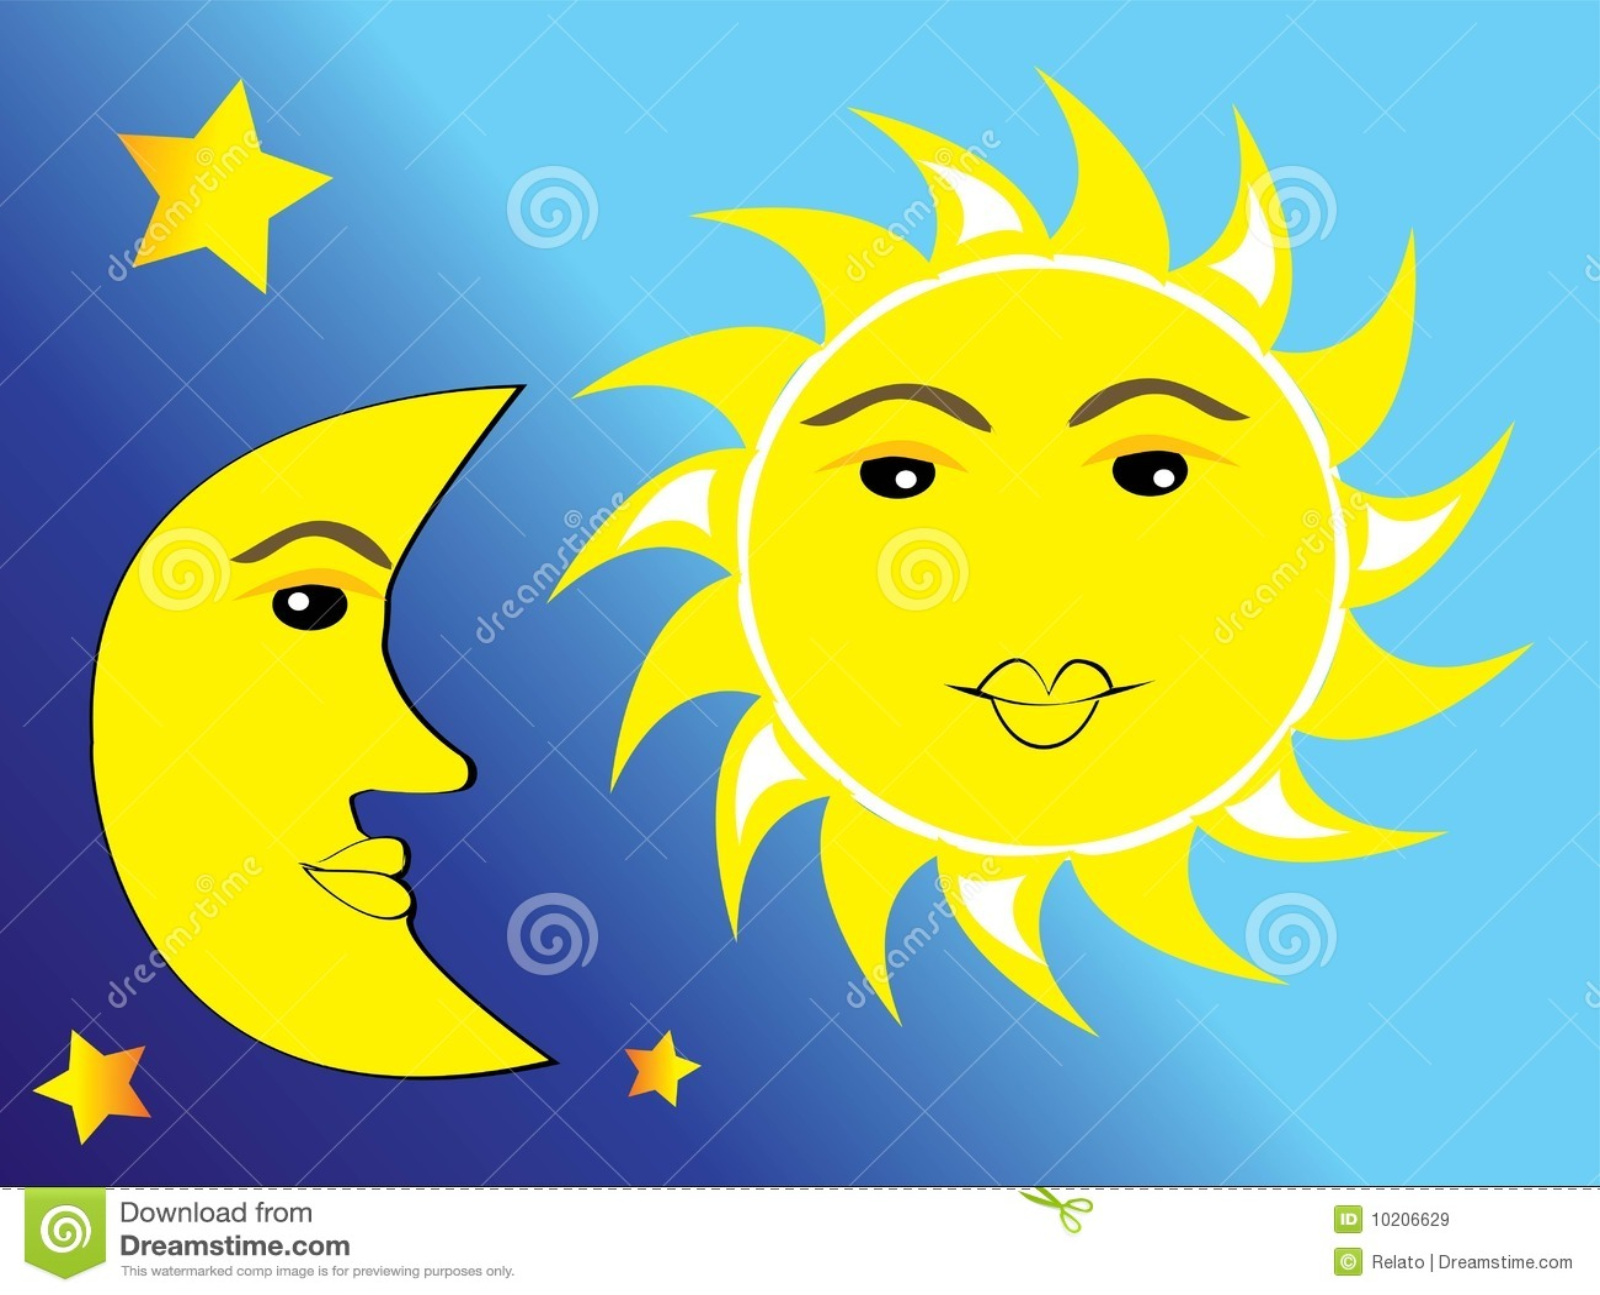 Sun Moon And Stars Stock Vector Illustration Of Bright